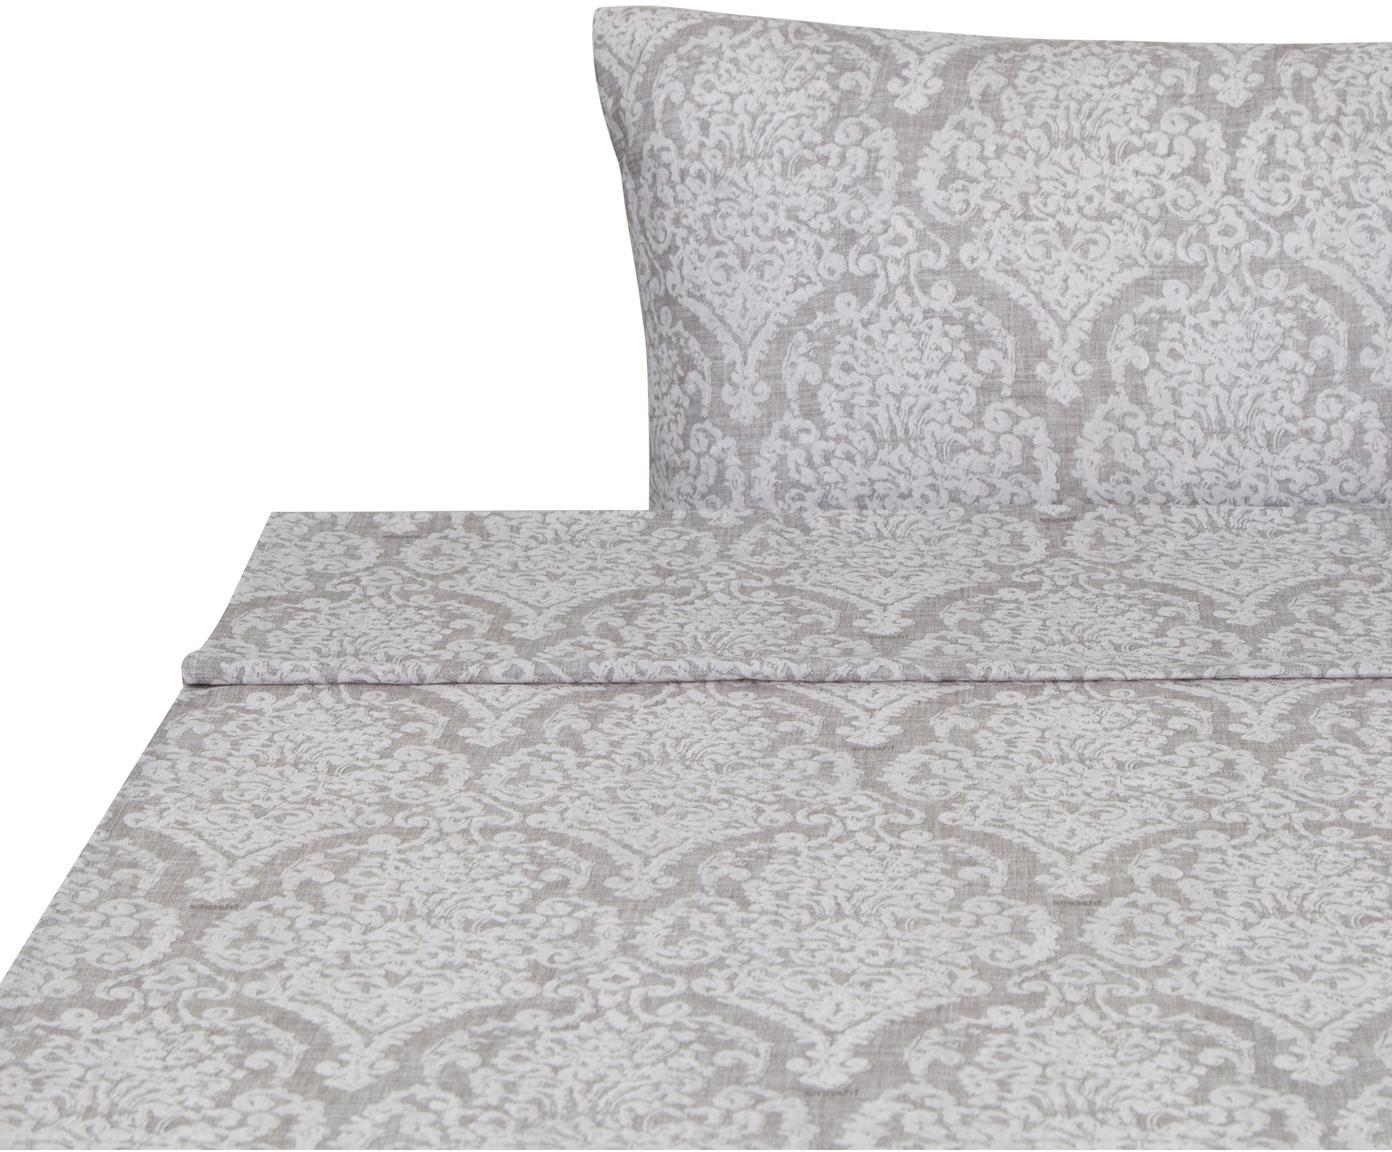 Sábana encimera Barroco, Algodón, Gris, gris claro, Cama 90 cm (160 x 270 cm)